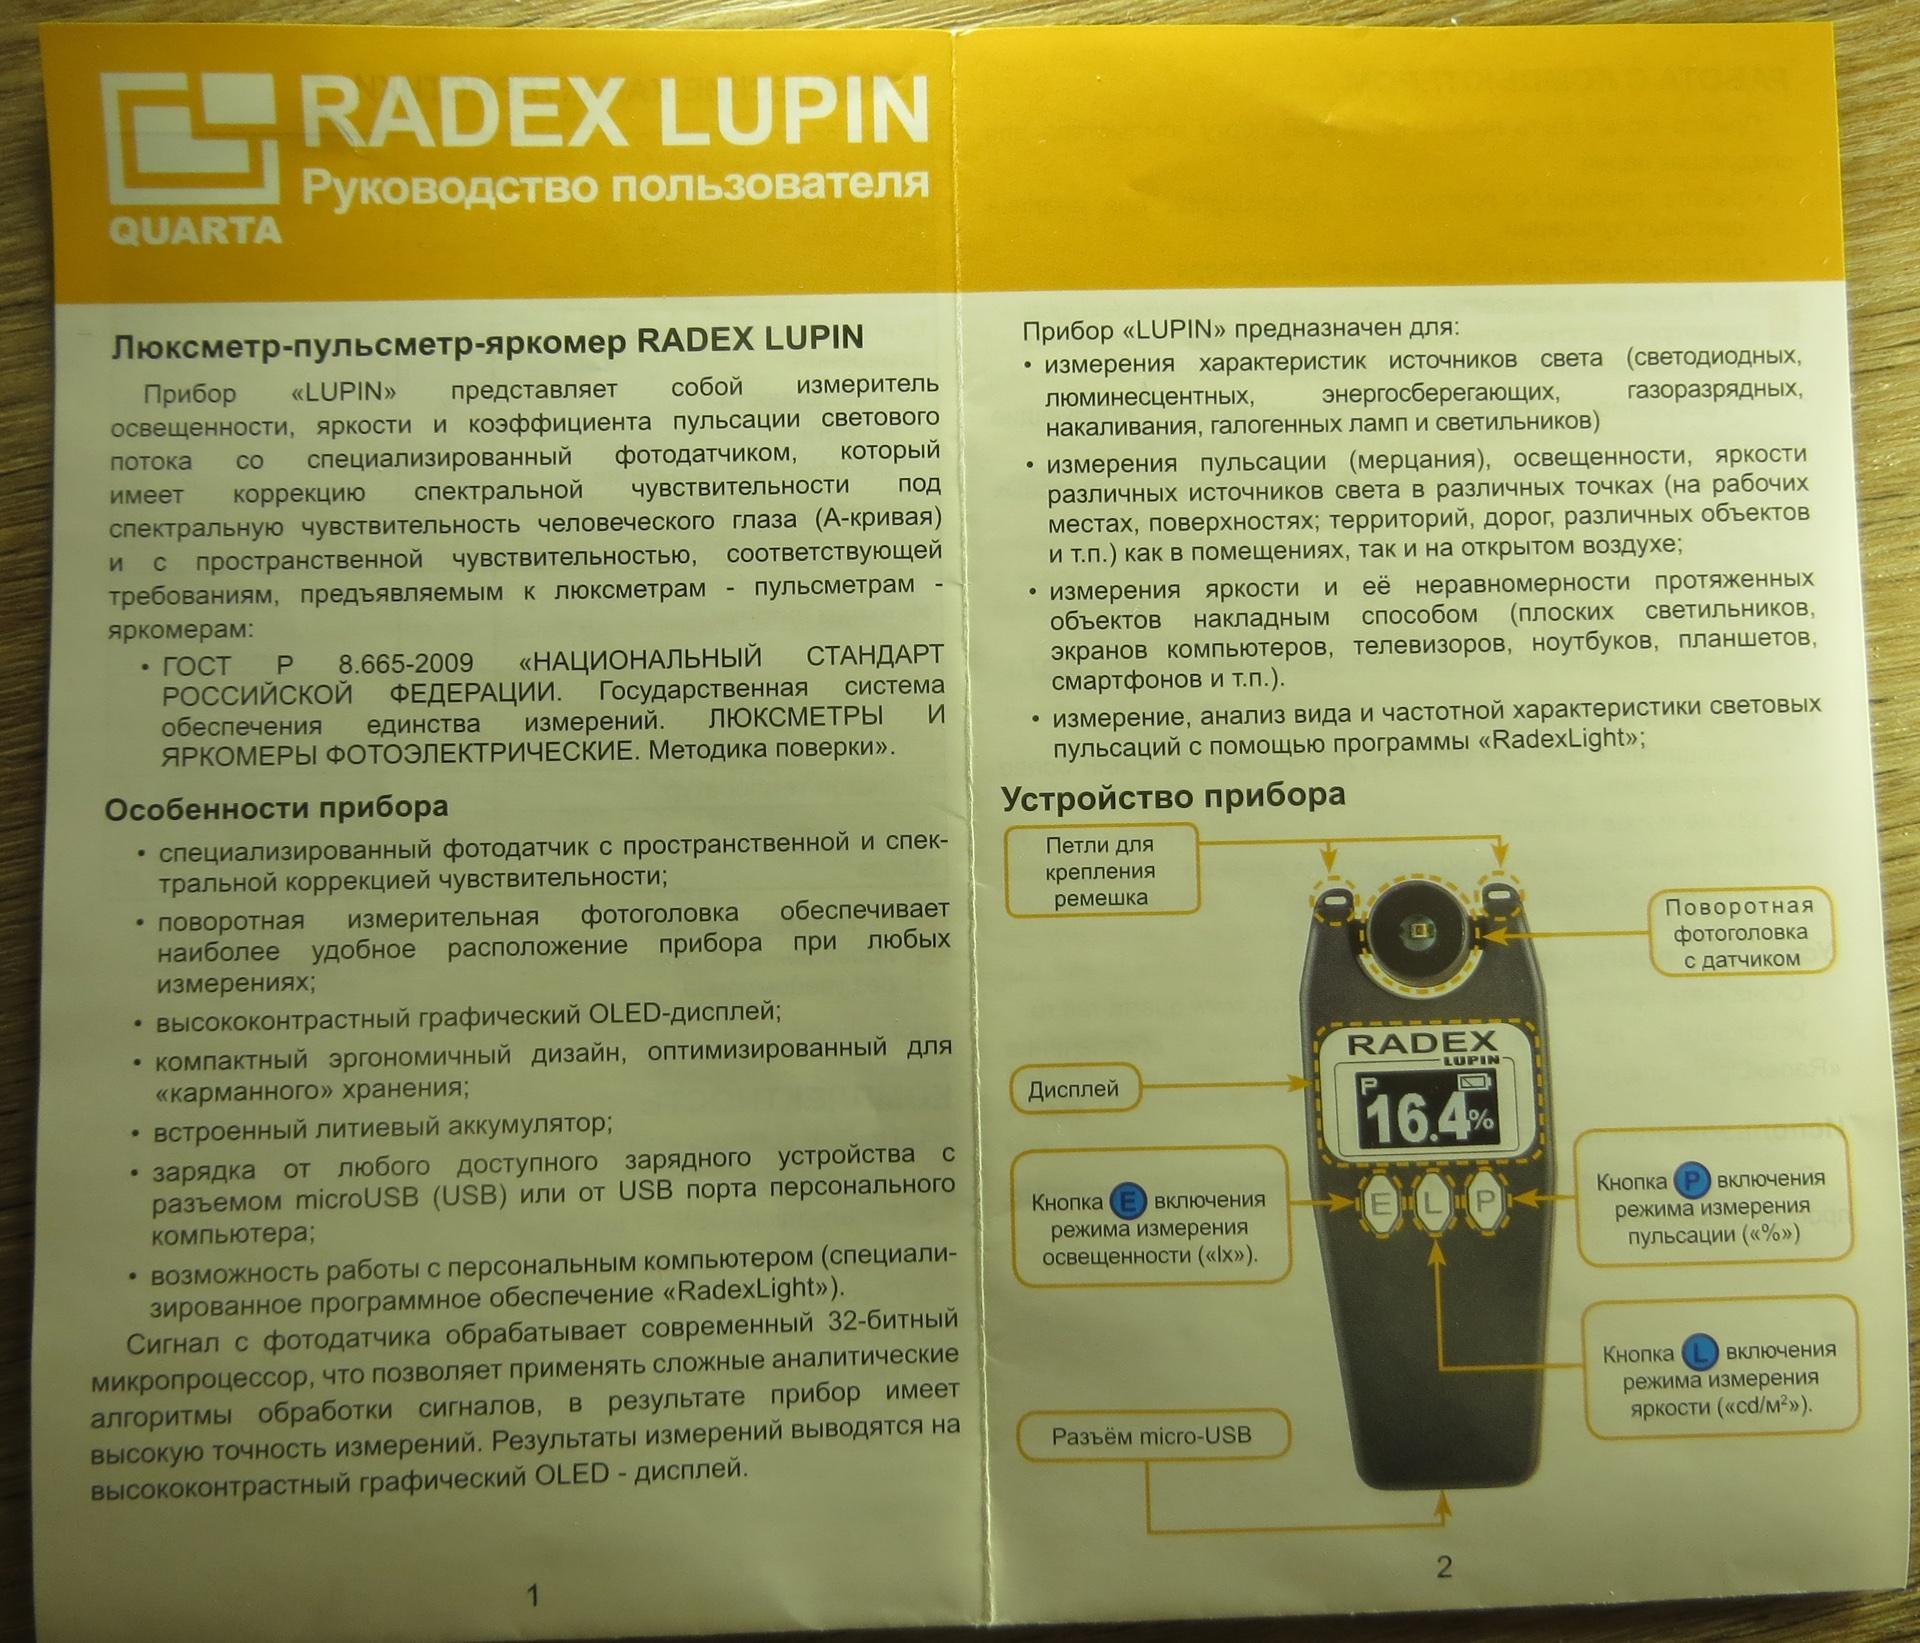 RADEX LUPIN руководство пользователя